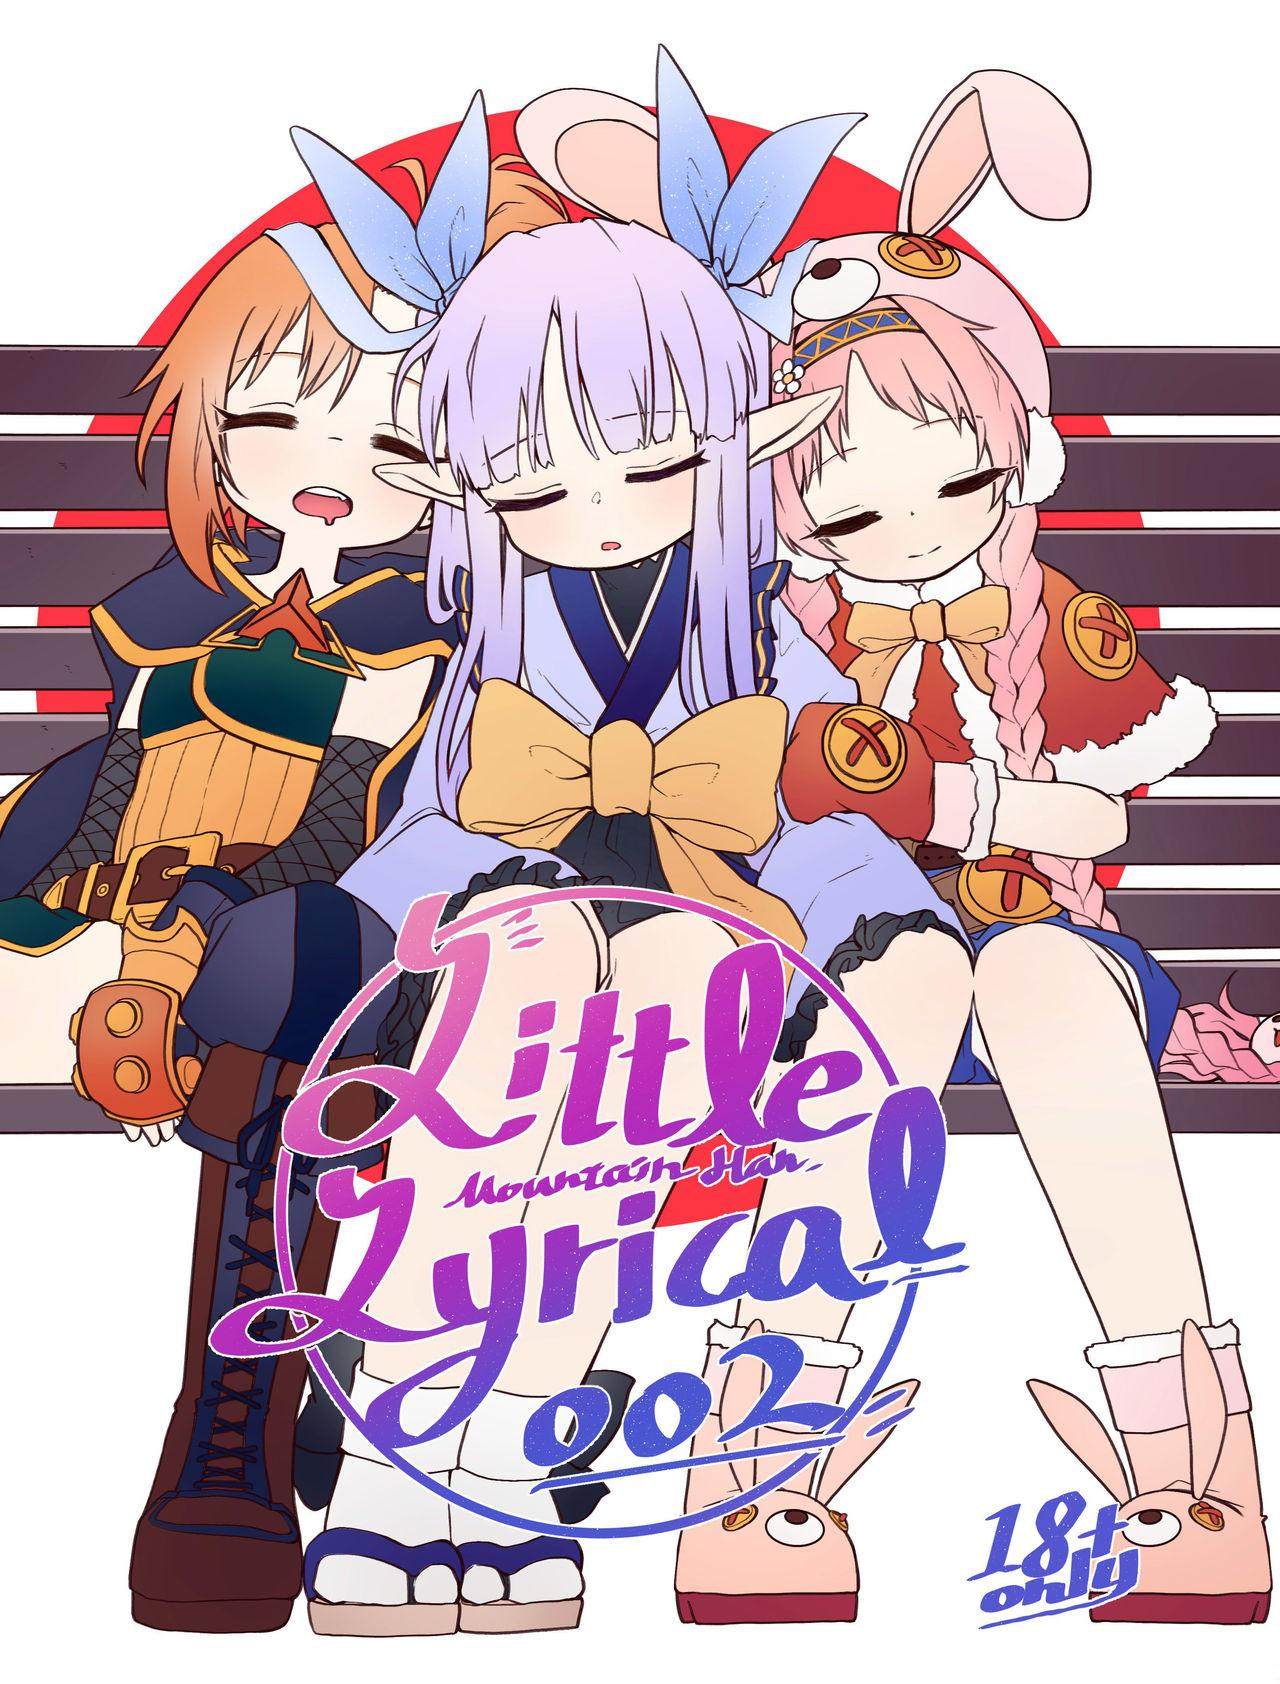 [MountainHan(山含)] Little Lyrical 002 (Princess Connect! Re:Dive) [Chinese] [切嚕系女子個人搬運] [Decensored] +小宣傳 0